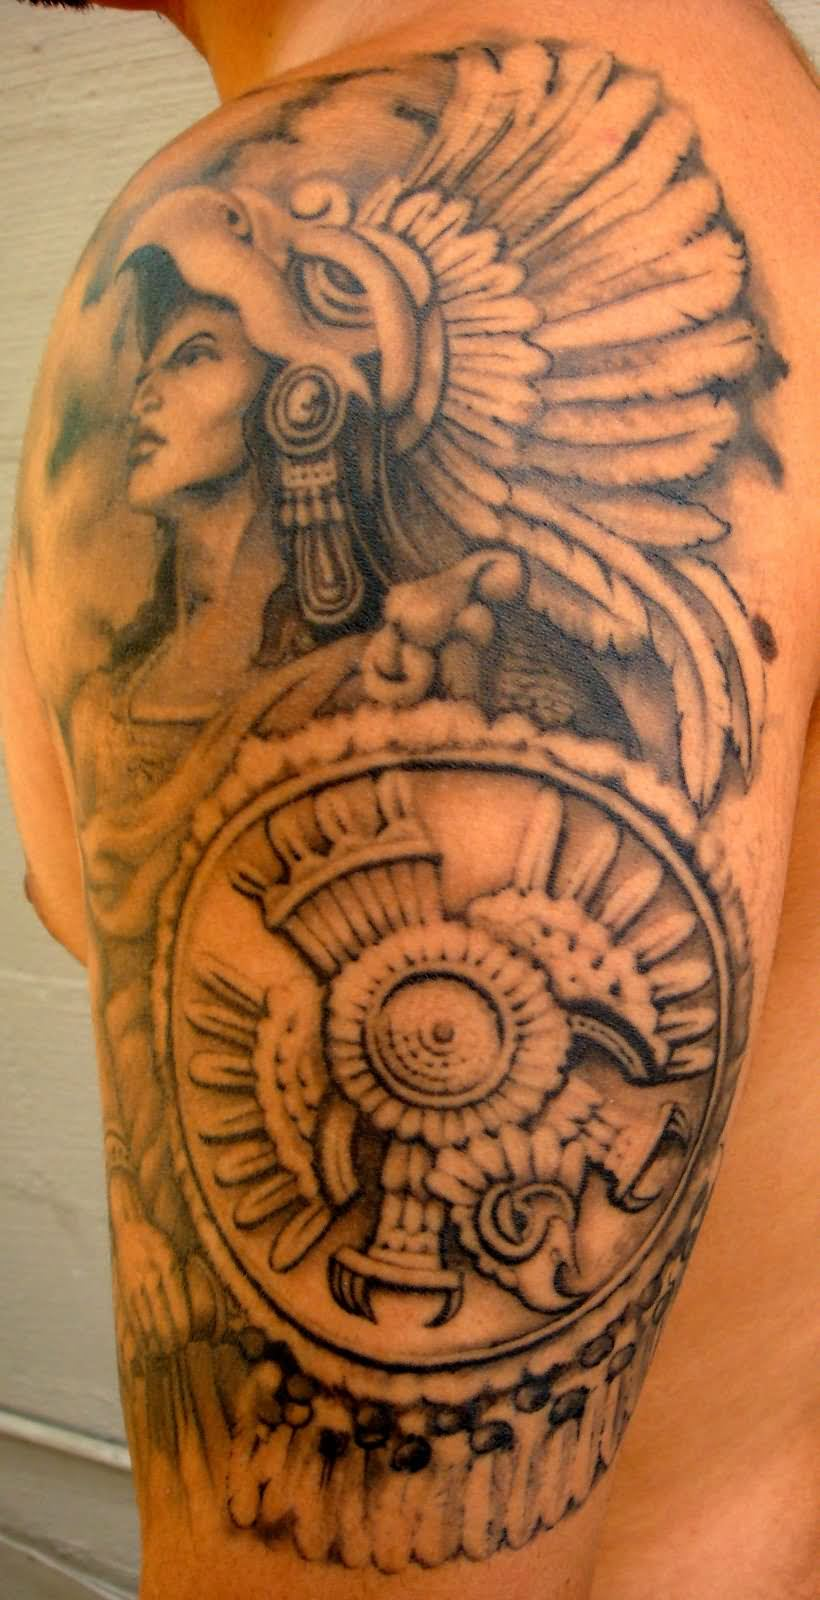 Small Art Tattoo Designs: Best Art Designs